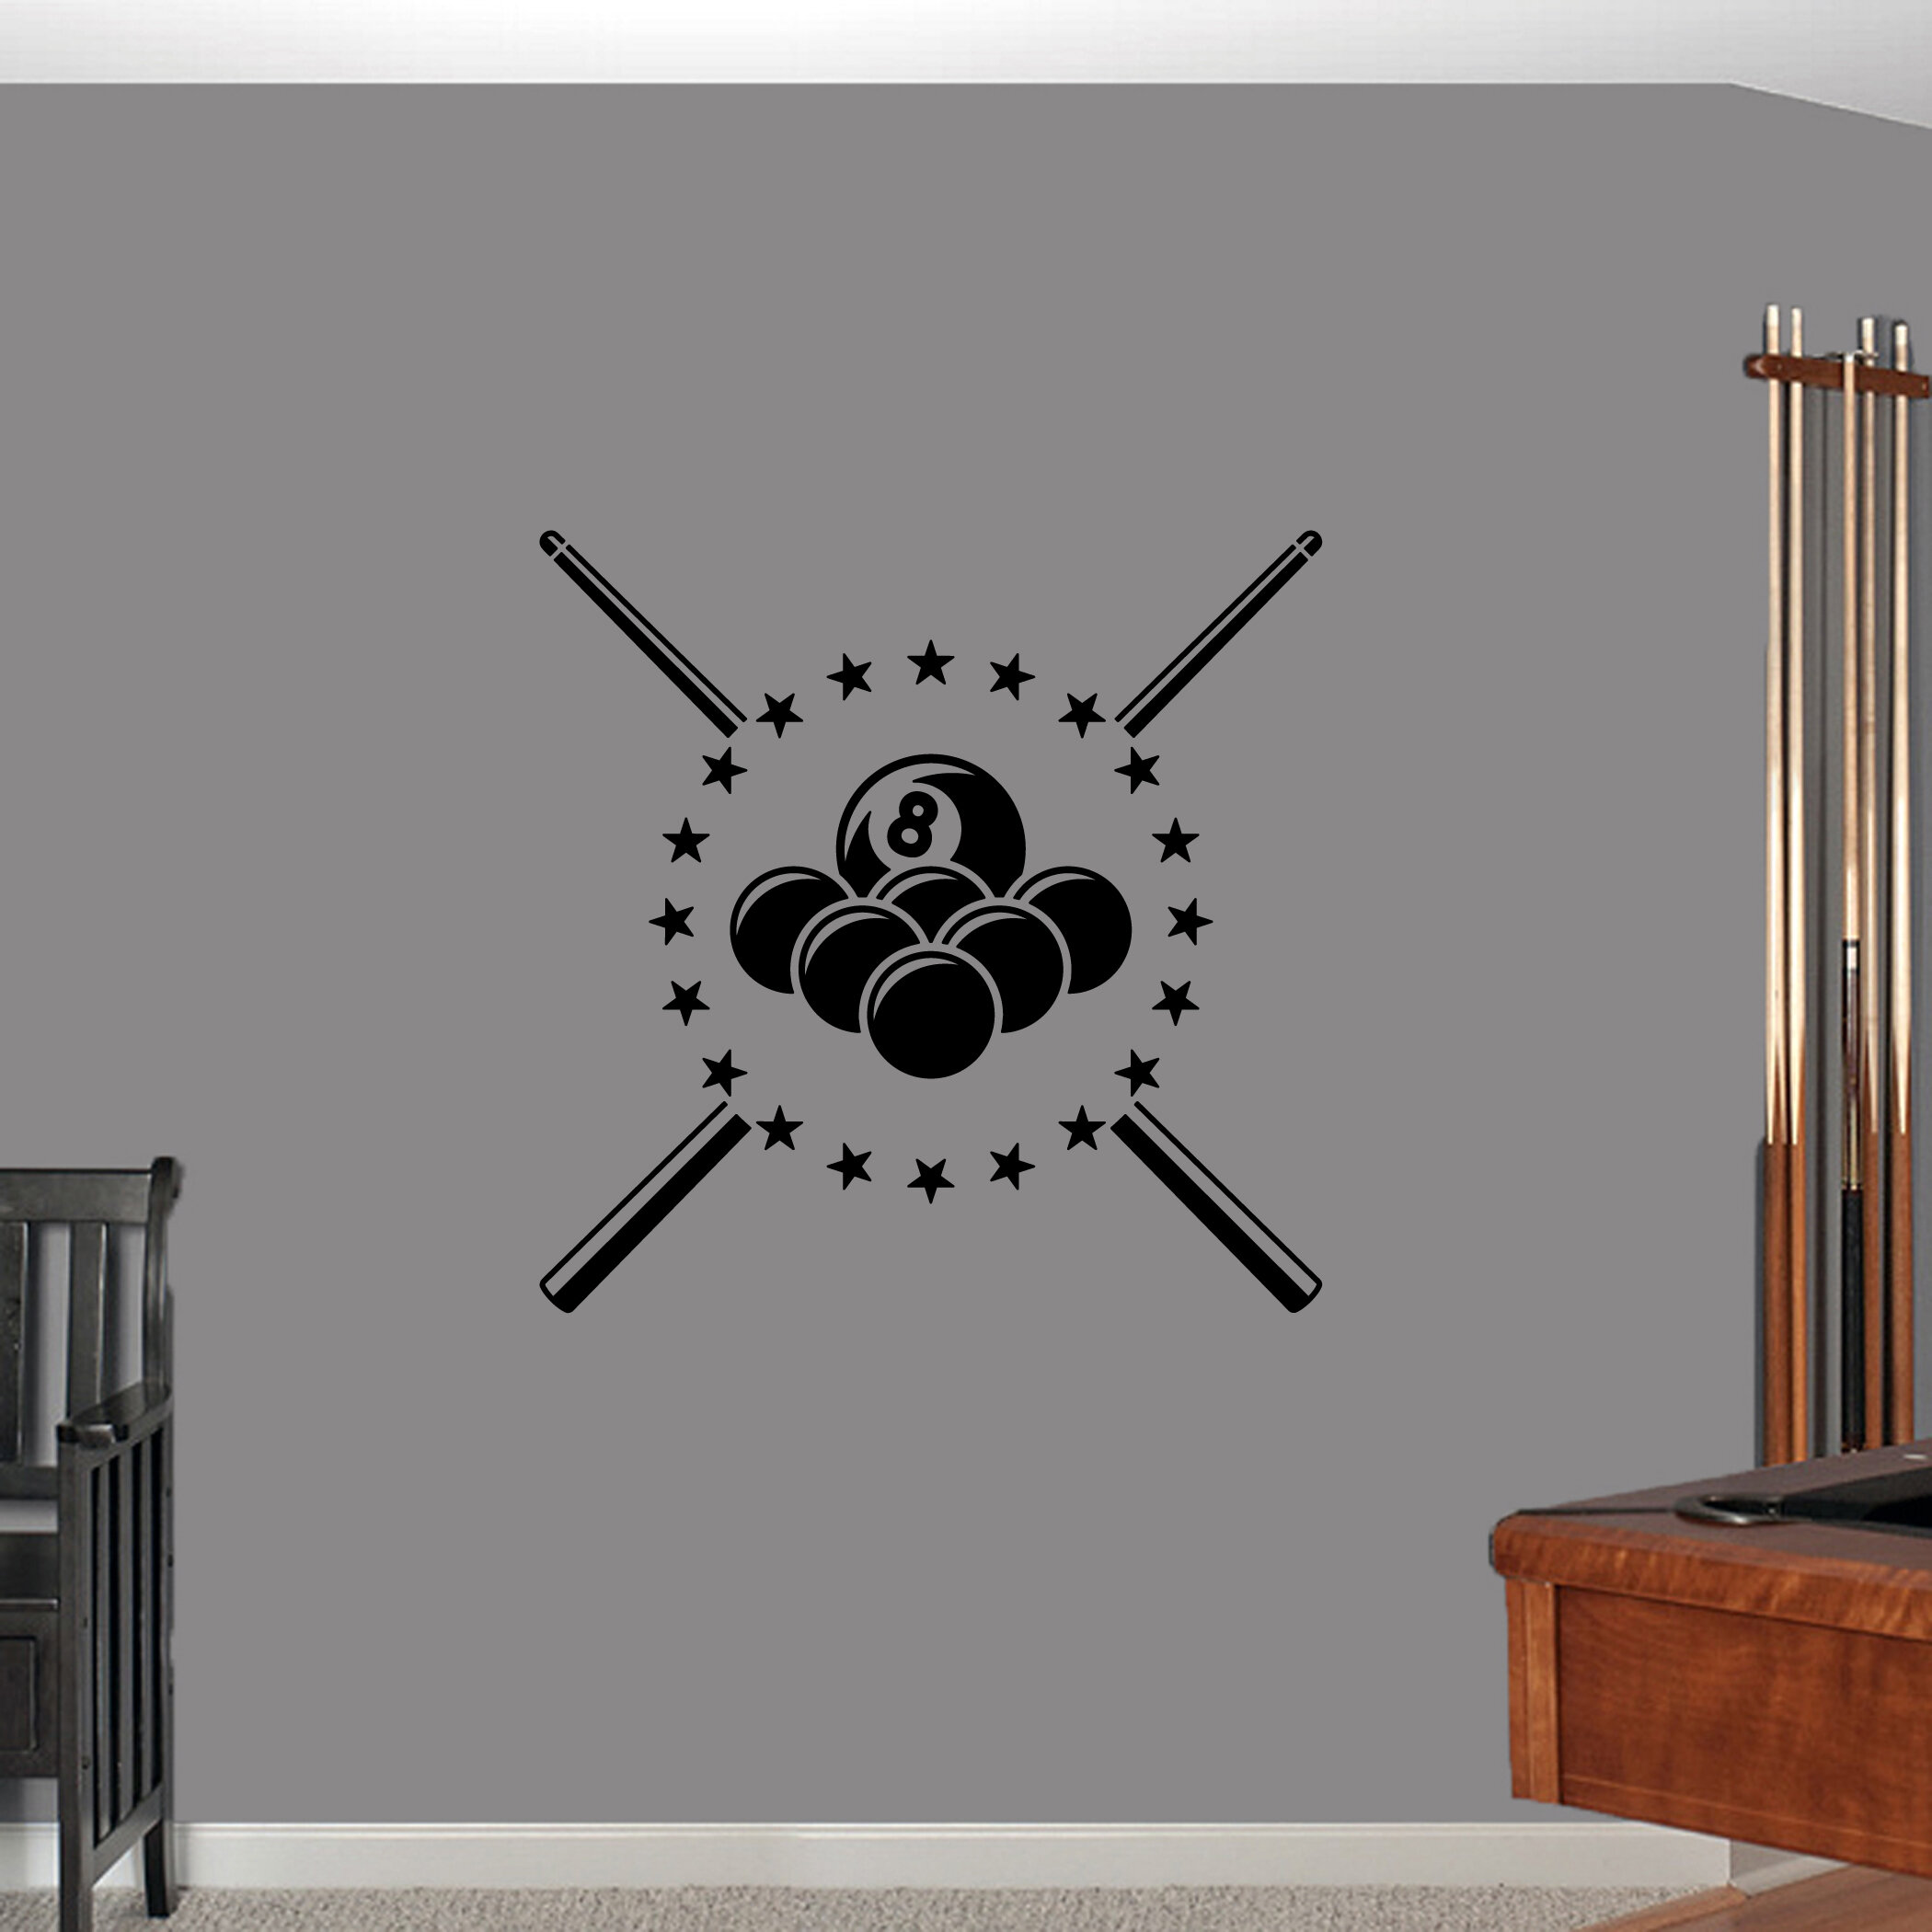 Ebern designs millan pool billiards stickers wall decal wayfair ca